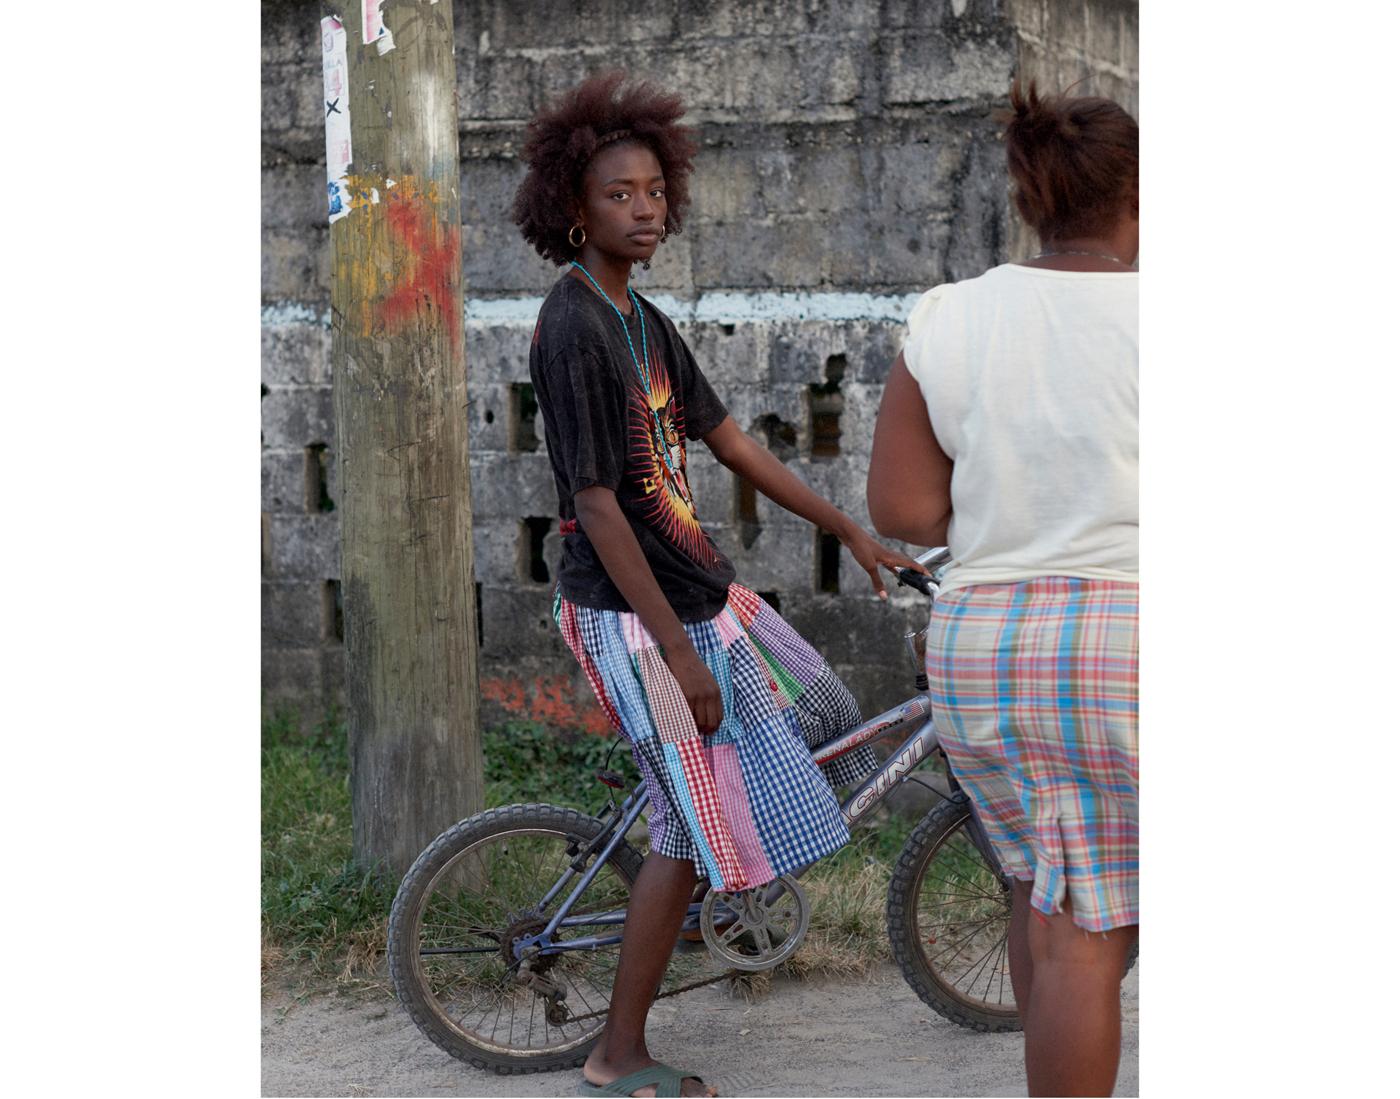 T-shirt by Gucci. Traditional Garifuna skirt.